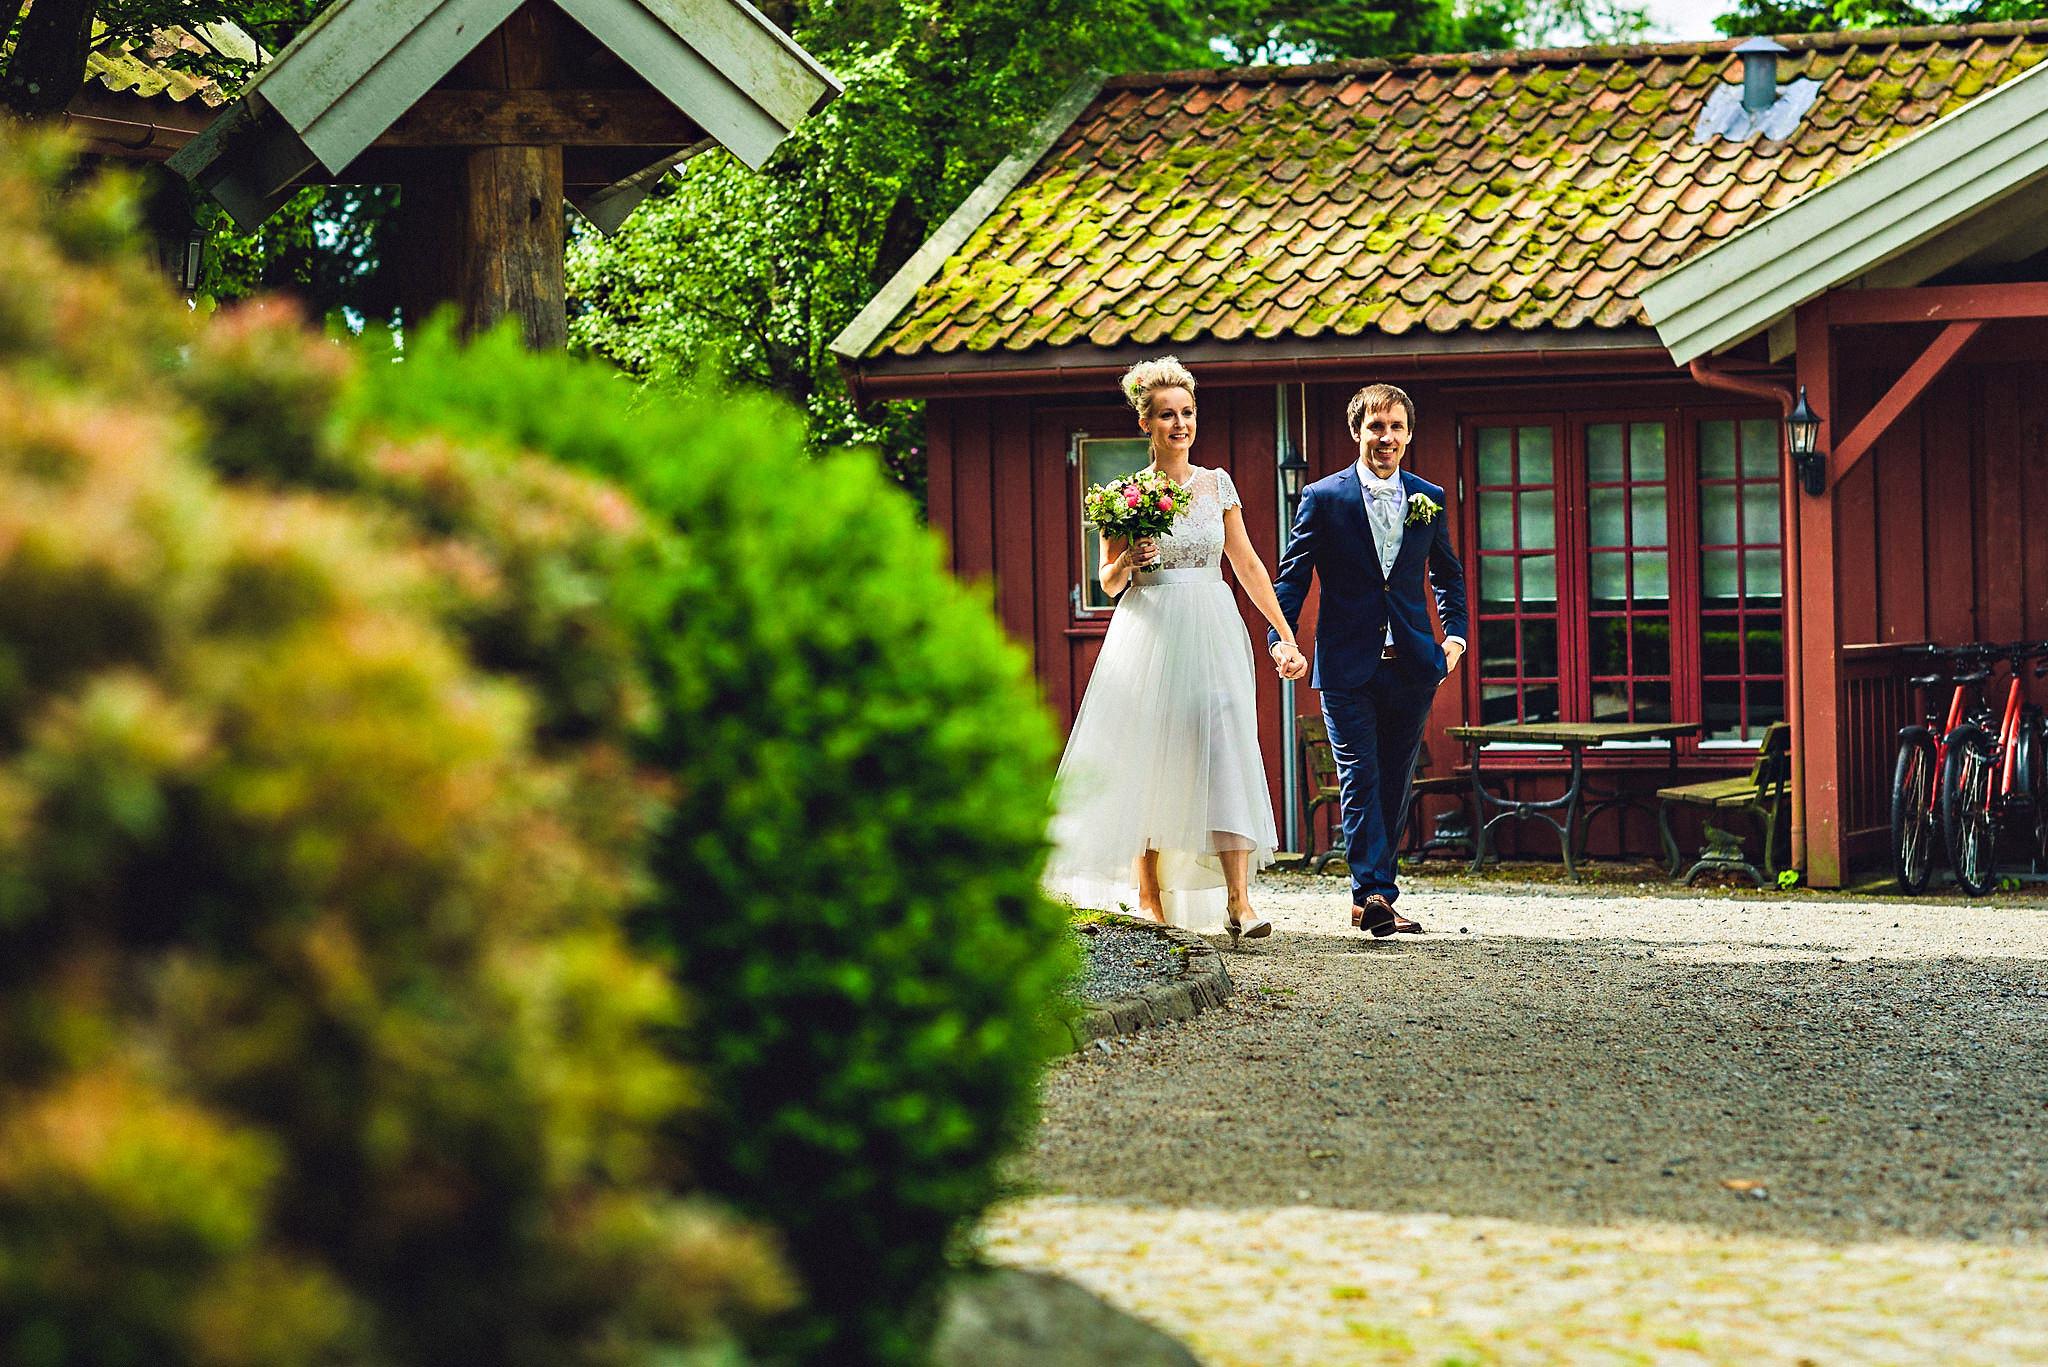 Eirik Halvorsen Cecilie og Are blog-9.jpg